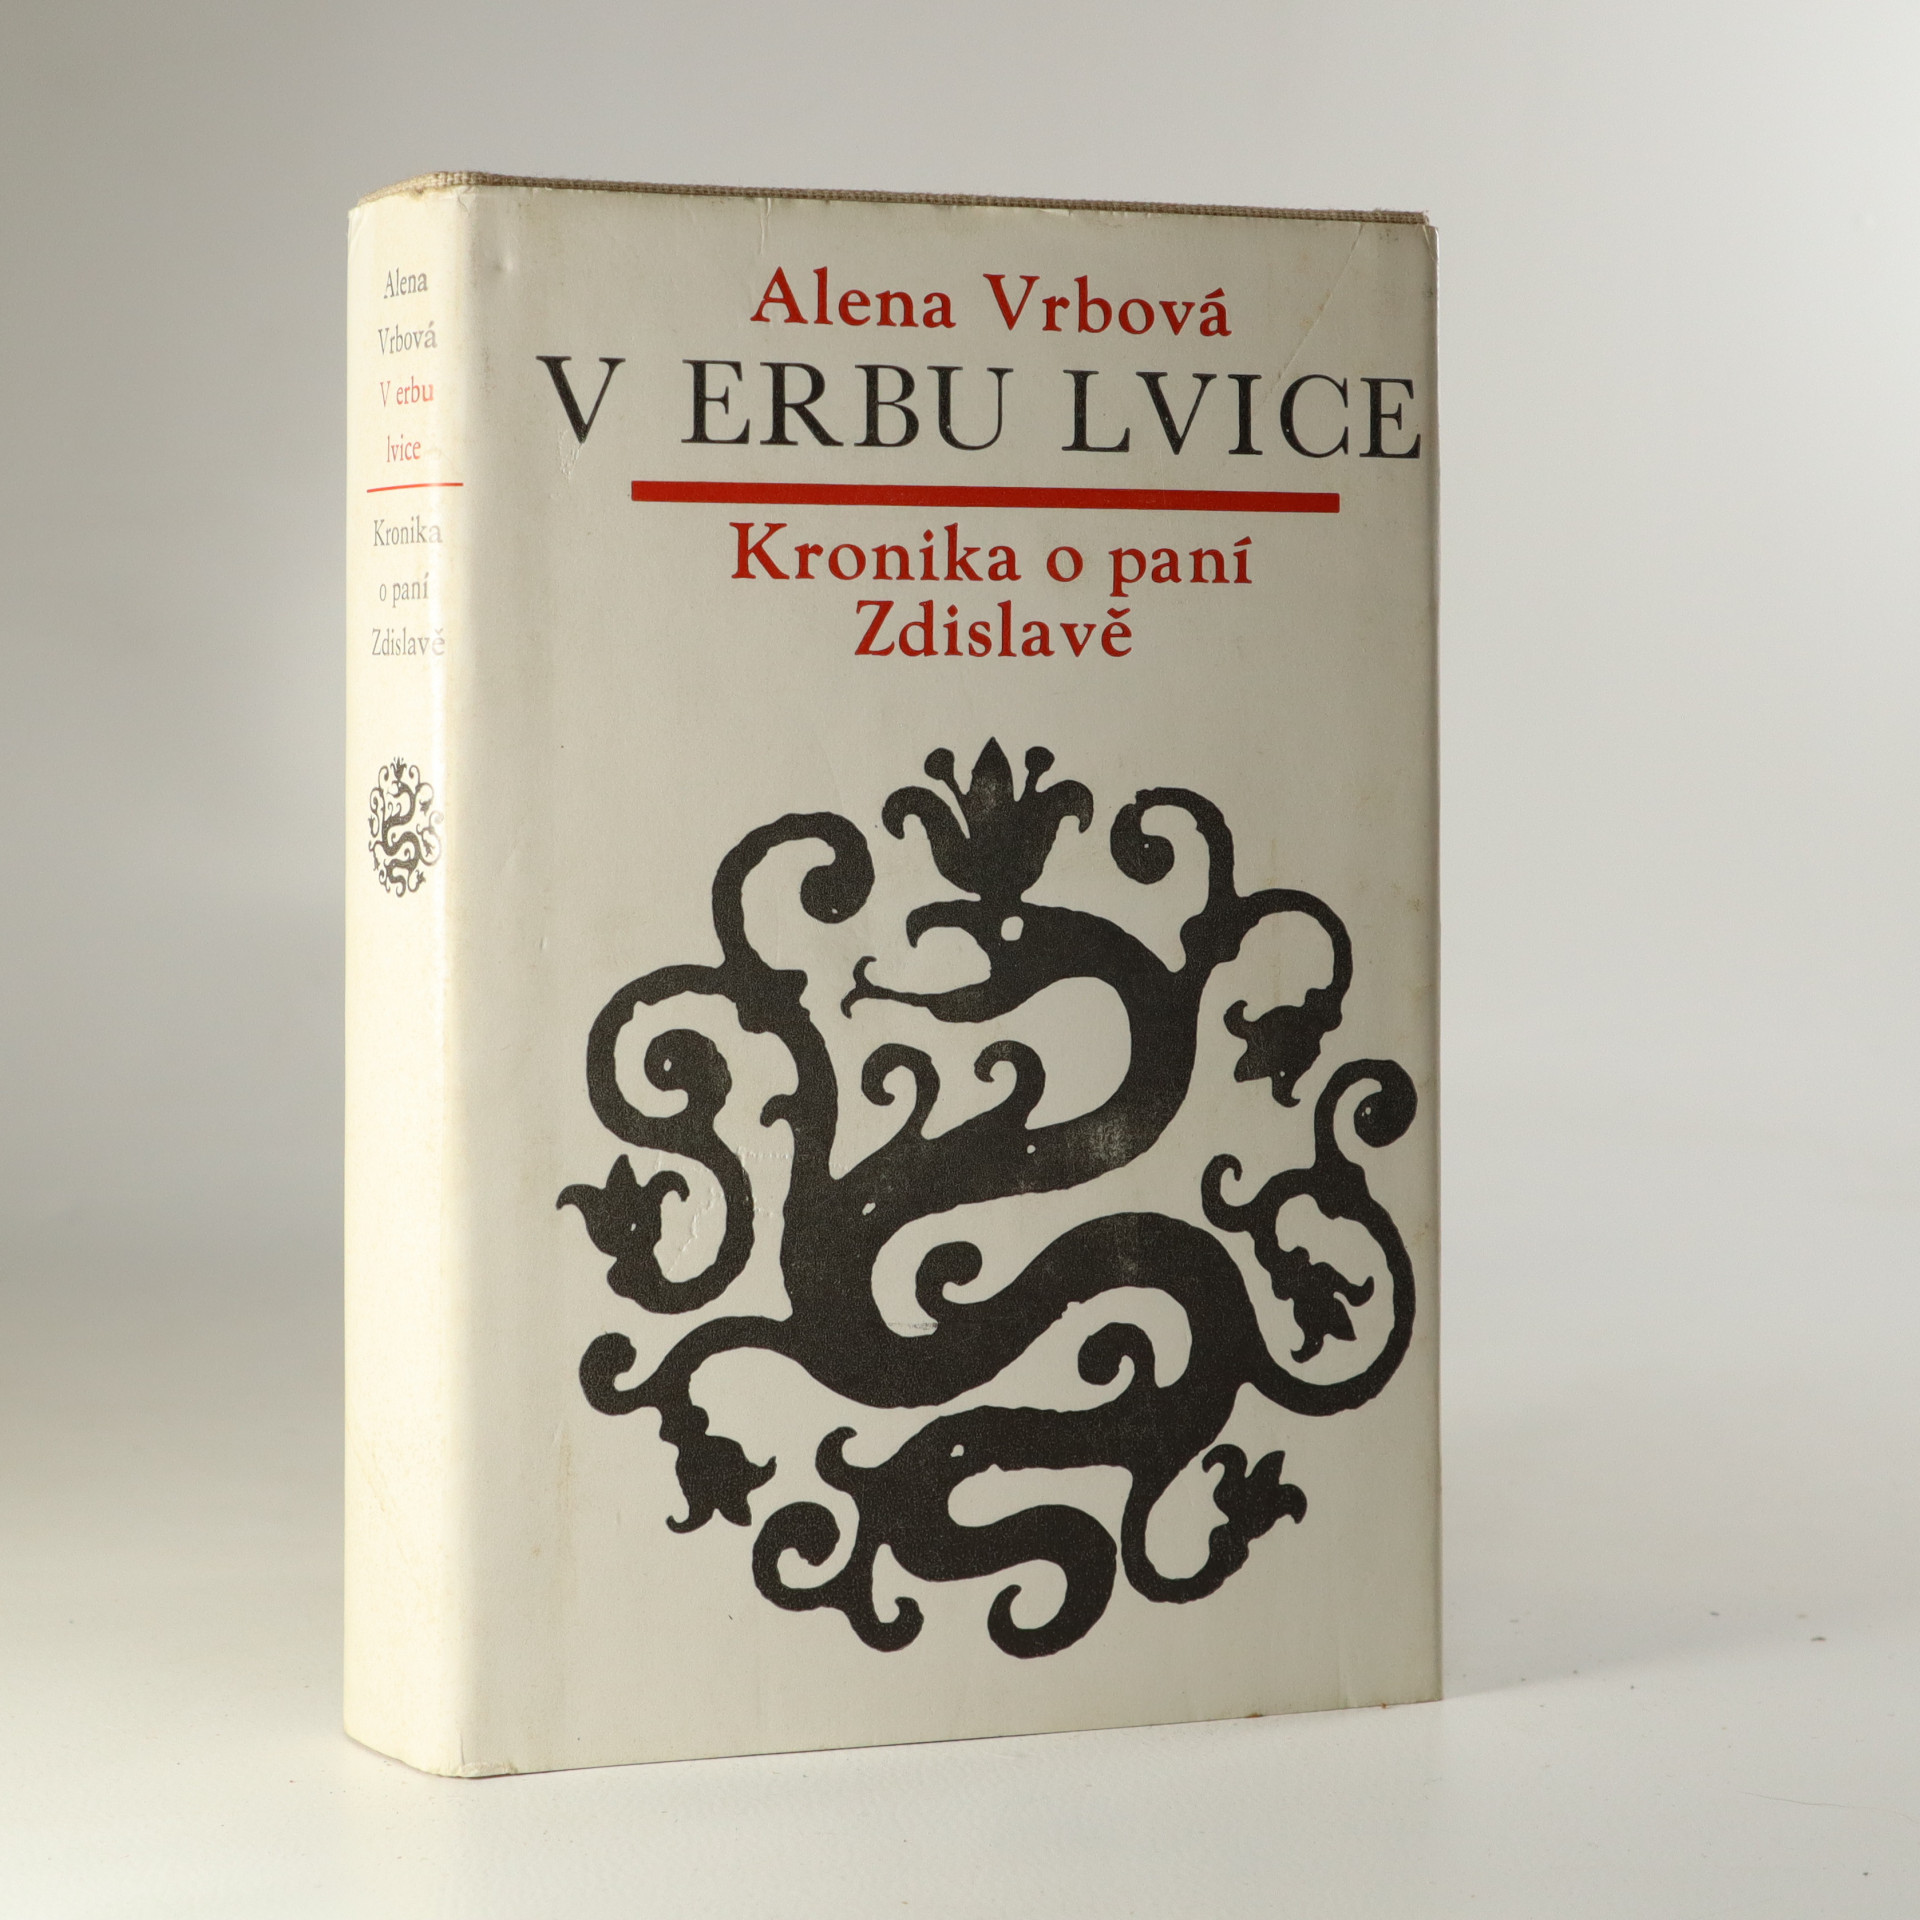 antikvární kniha V erbu lvice. Kronika o paní Zdislavě., 1982